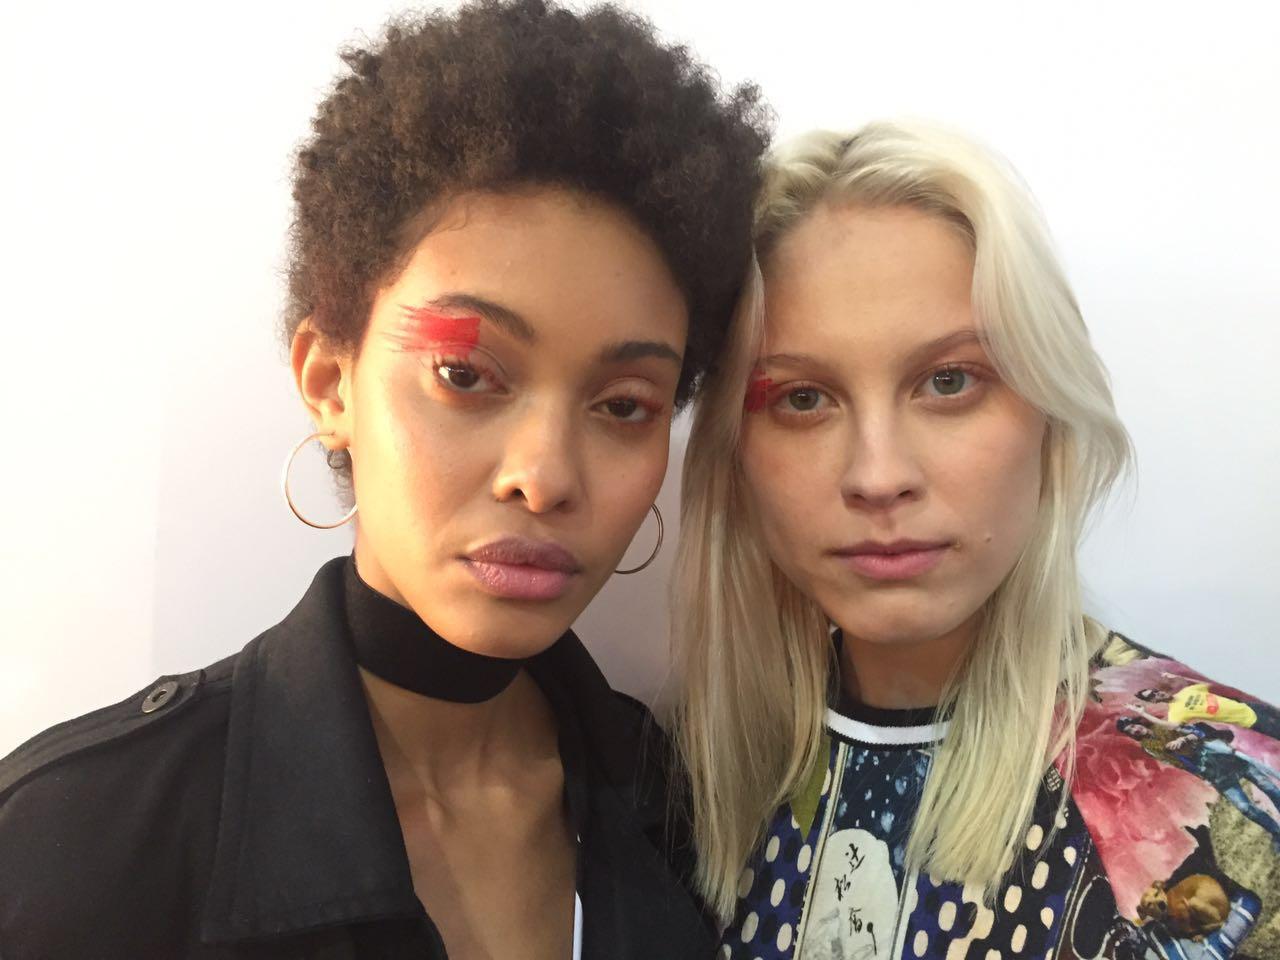 As modelos prontas antes de entrar na passarela. A make explorou cor vermelha nas pálpebras dos olhos - Crédito: Thayse Boldrini/DP